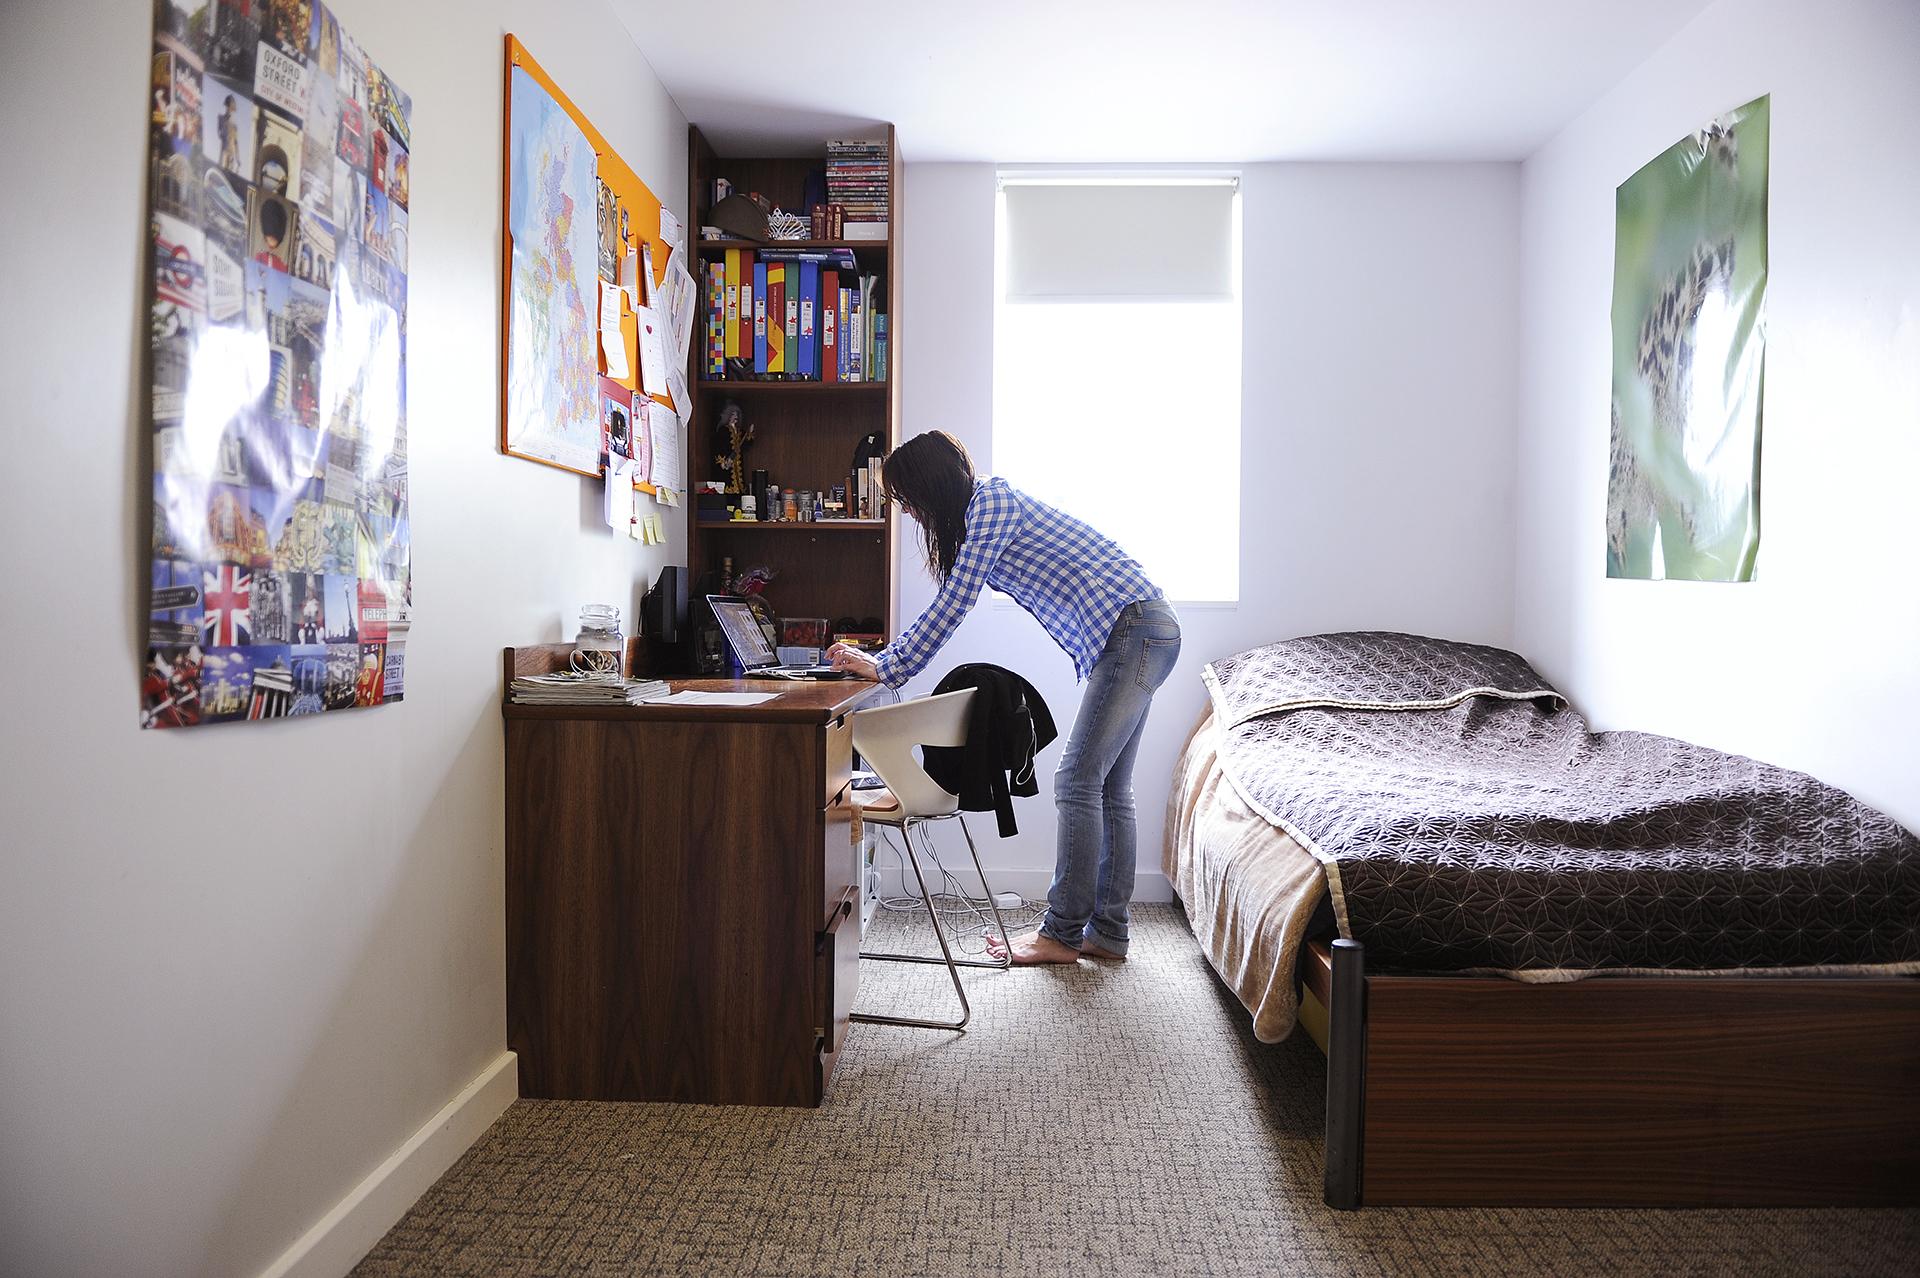 INTO UEA中心学生宿舍内的私人学习卧室